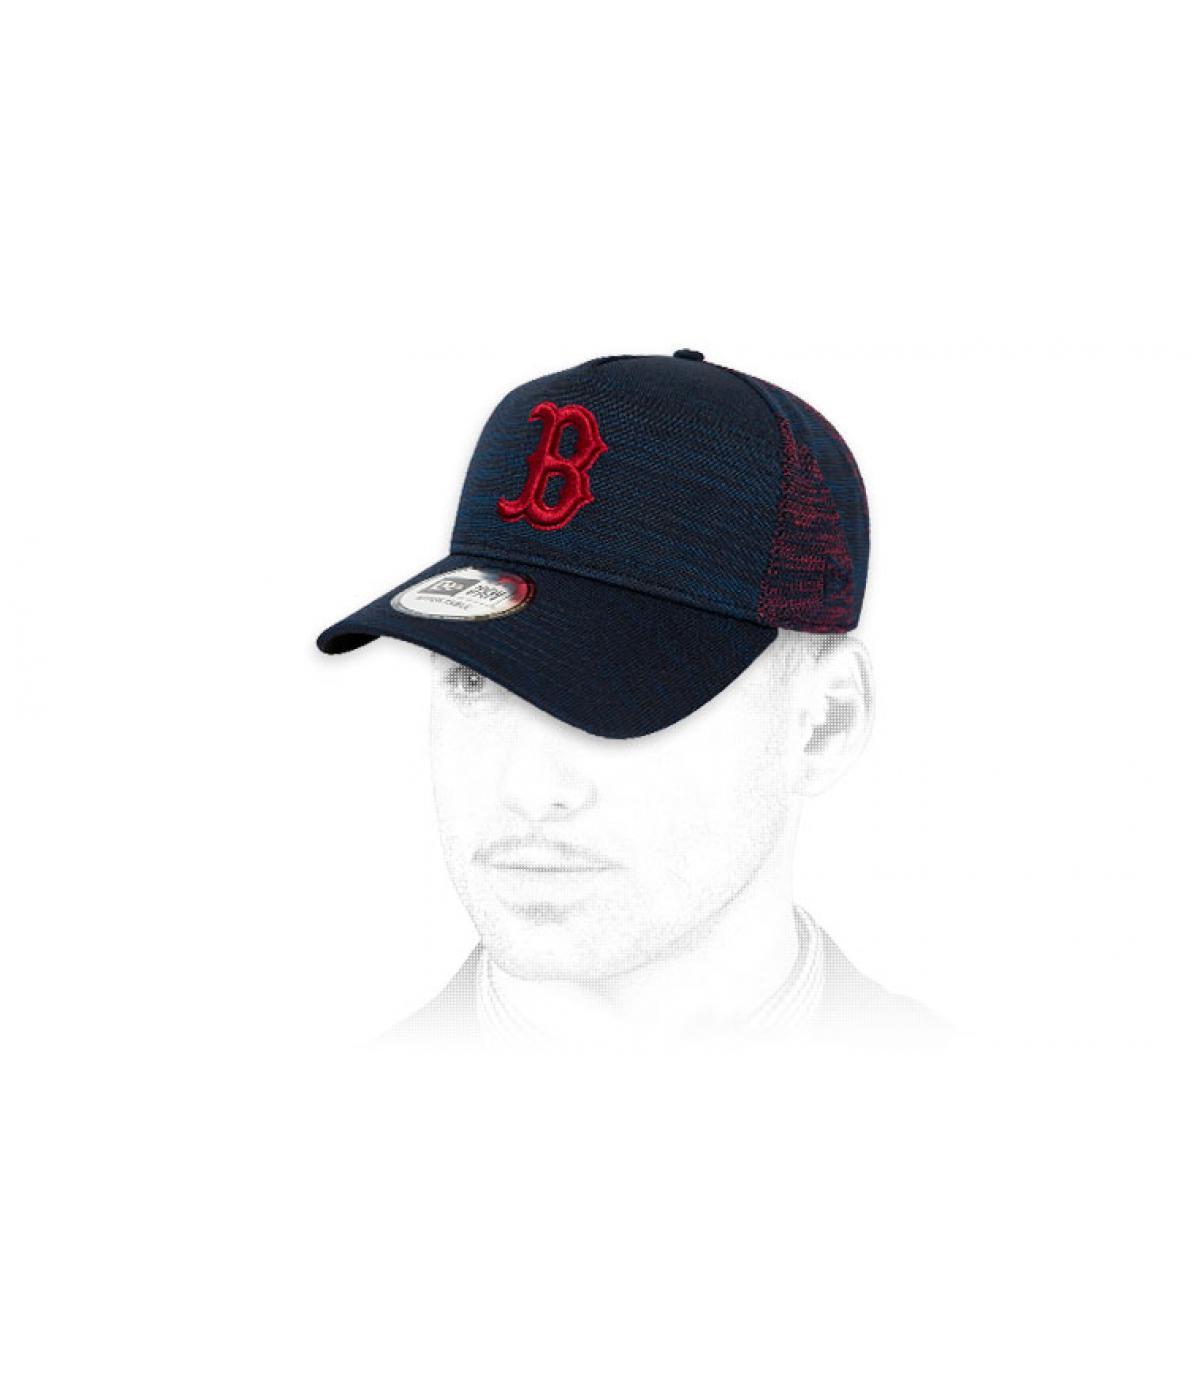 dop B blauw rood